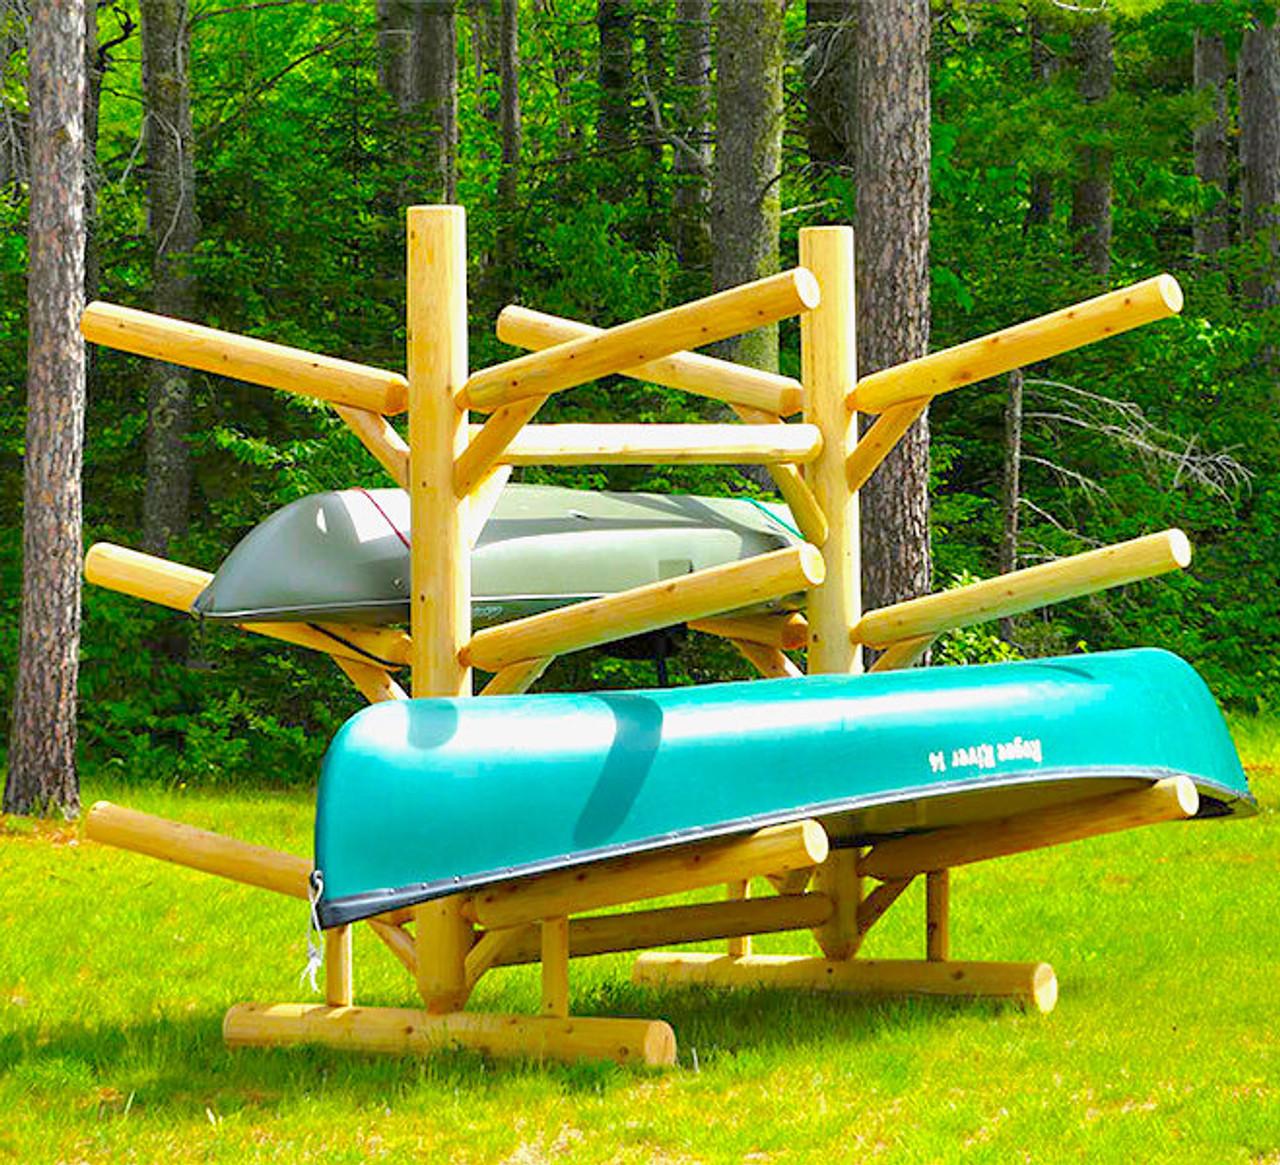 6 sup and kayak storage rack freestanding log rack